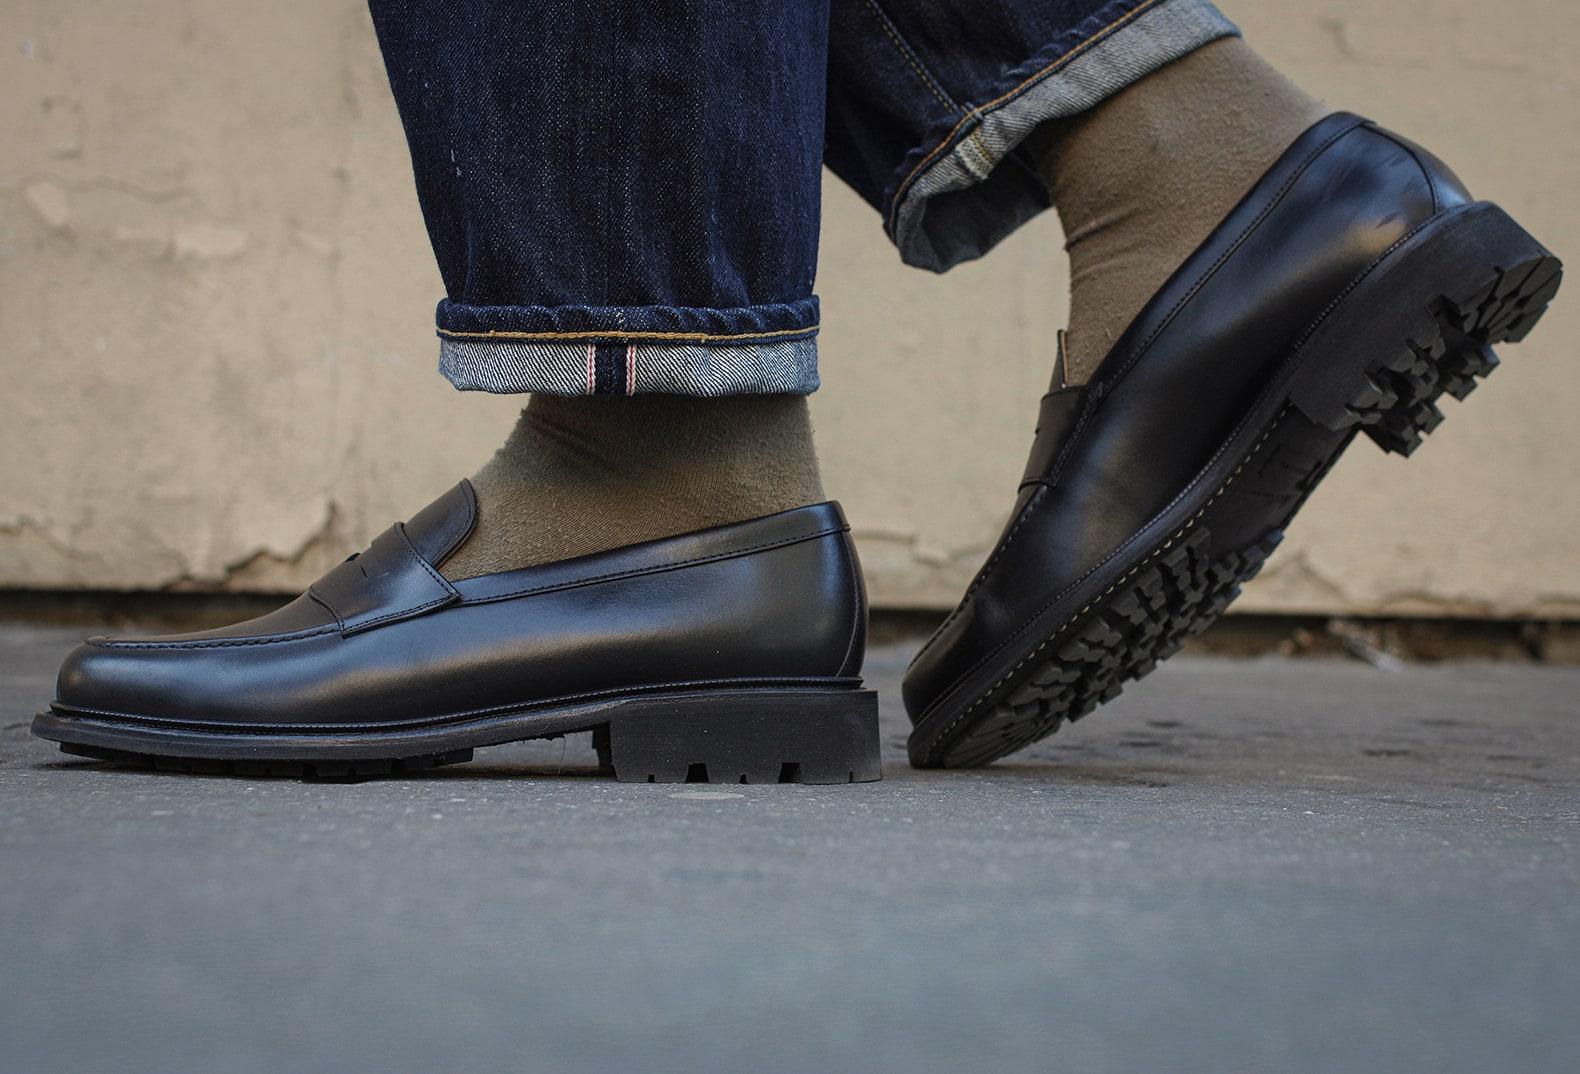 le super moc paul de la marque de chaussures max sauveurs